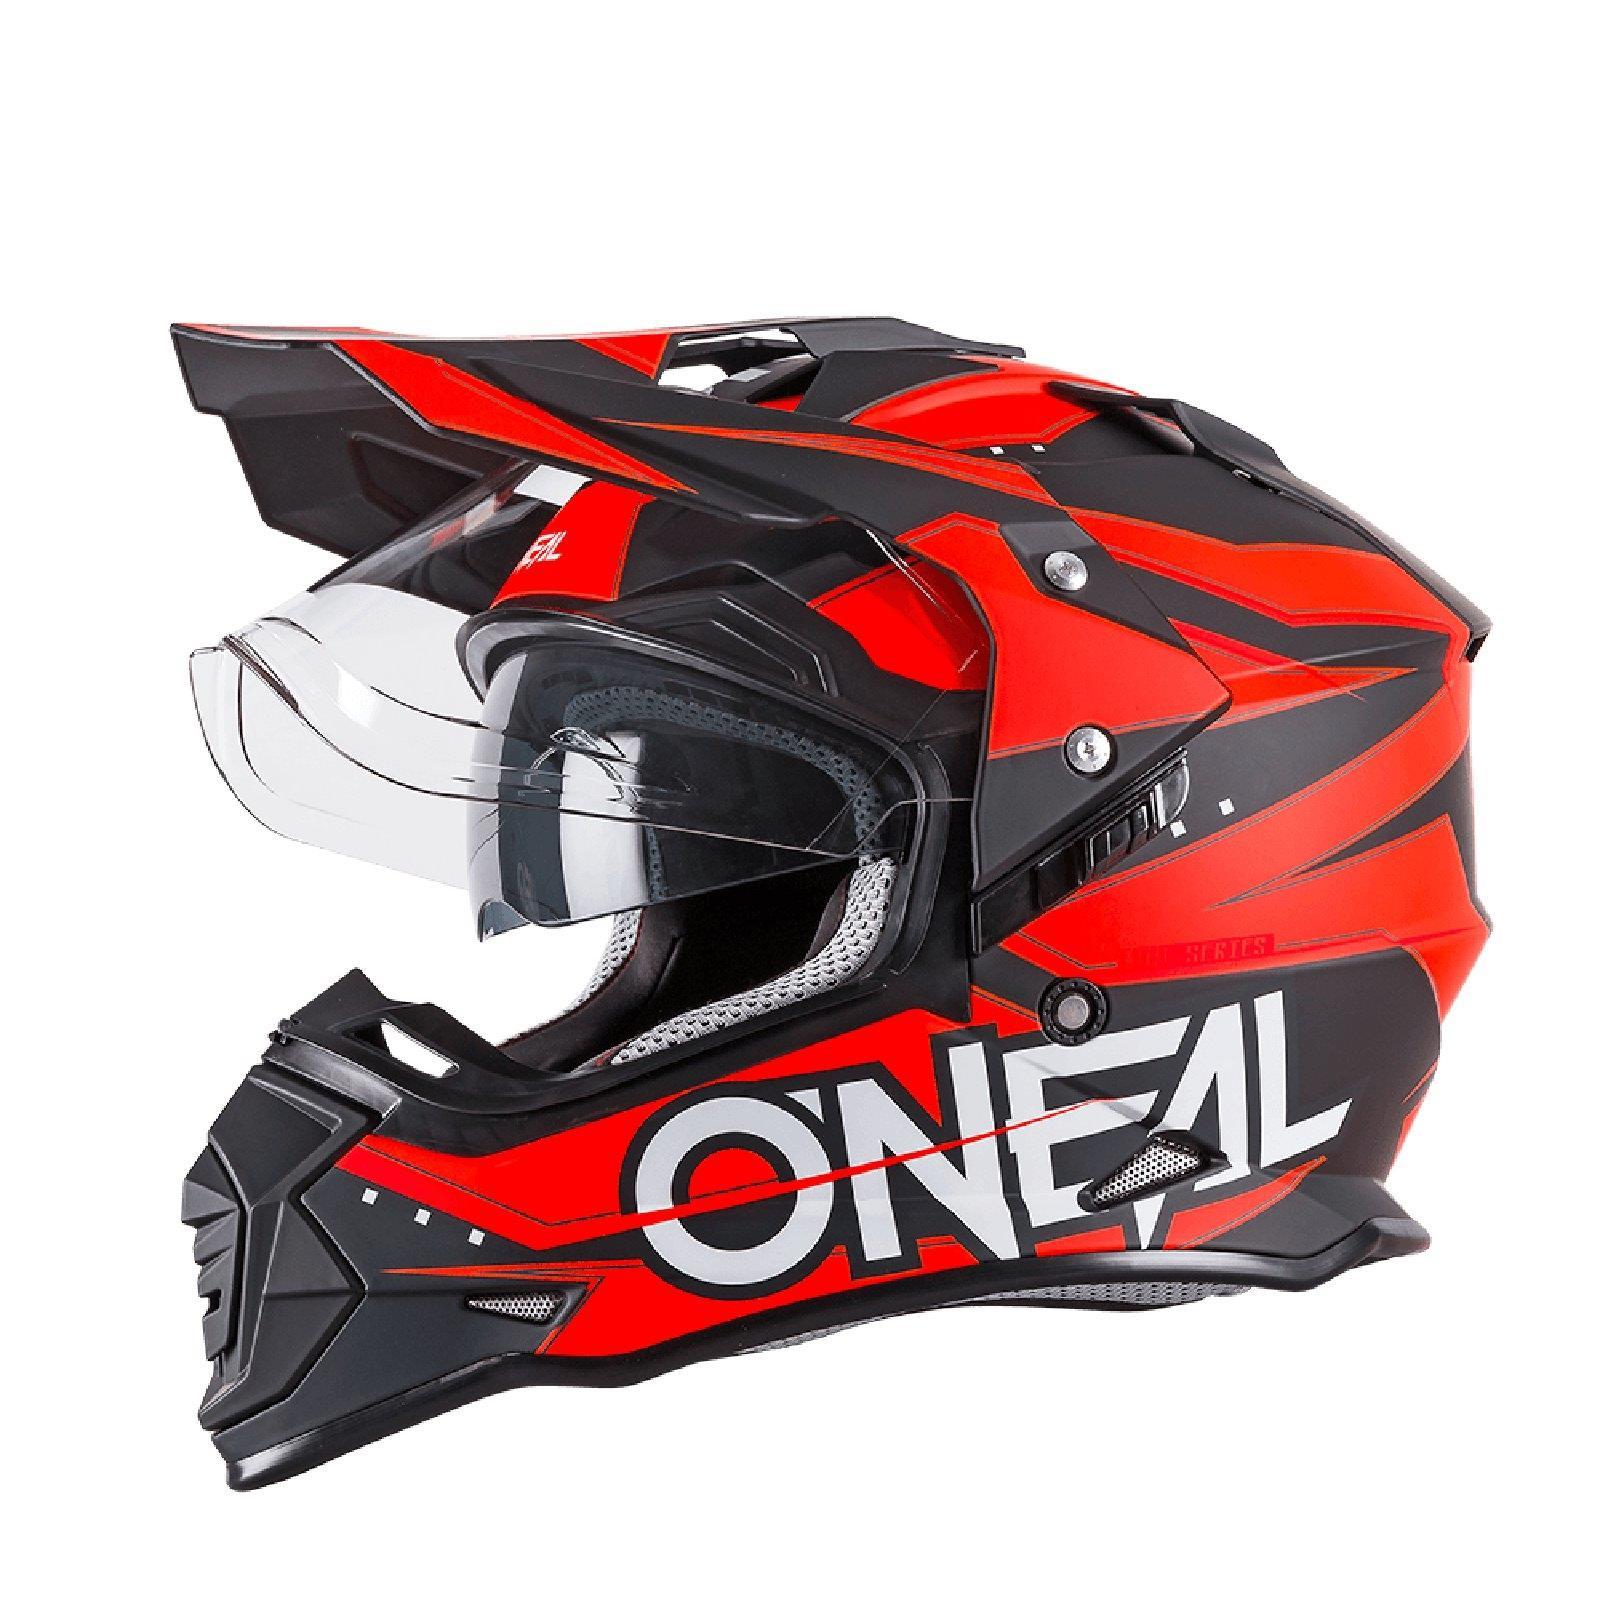 o 39 neal sierra ii helmet slingshot motorcycle motocross mx enduro quad offroad cross ebay. Black Bedroom Furniture Sets. Home Design Ideas